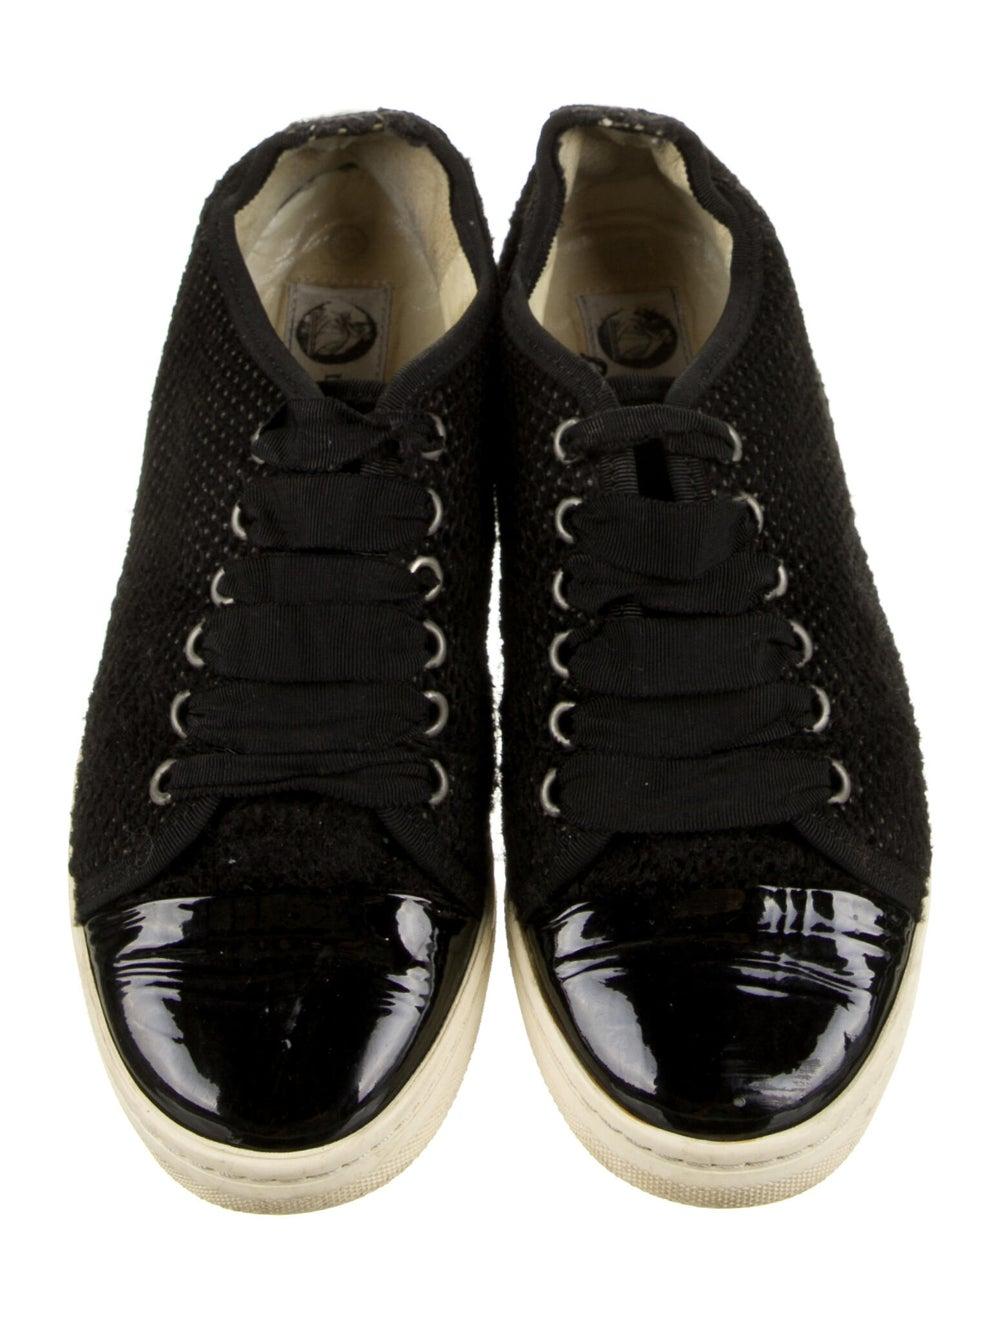 Lanvin Sneakers Black - image 3